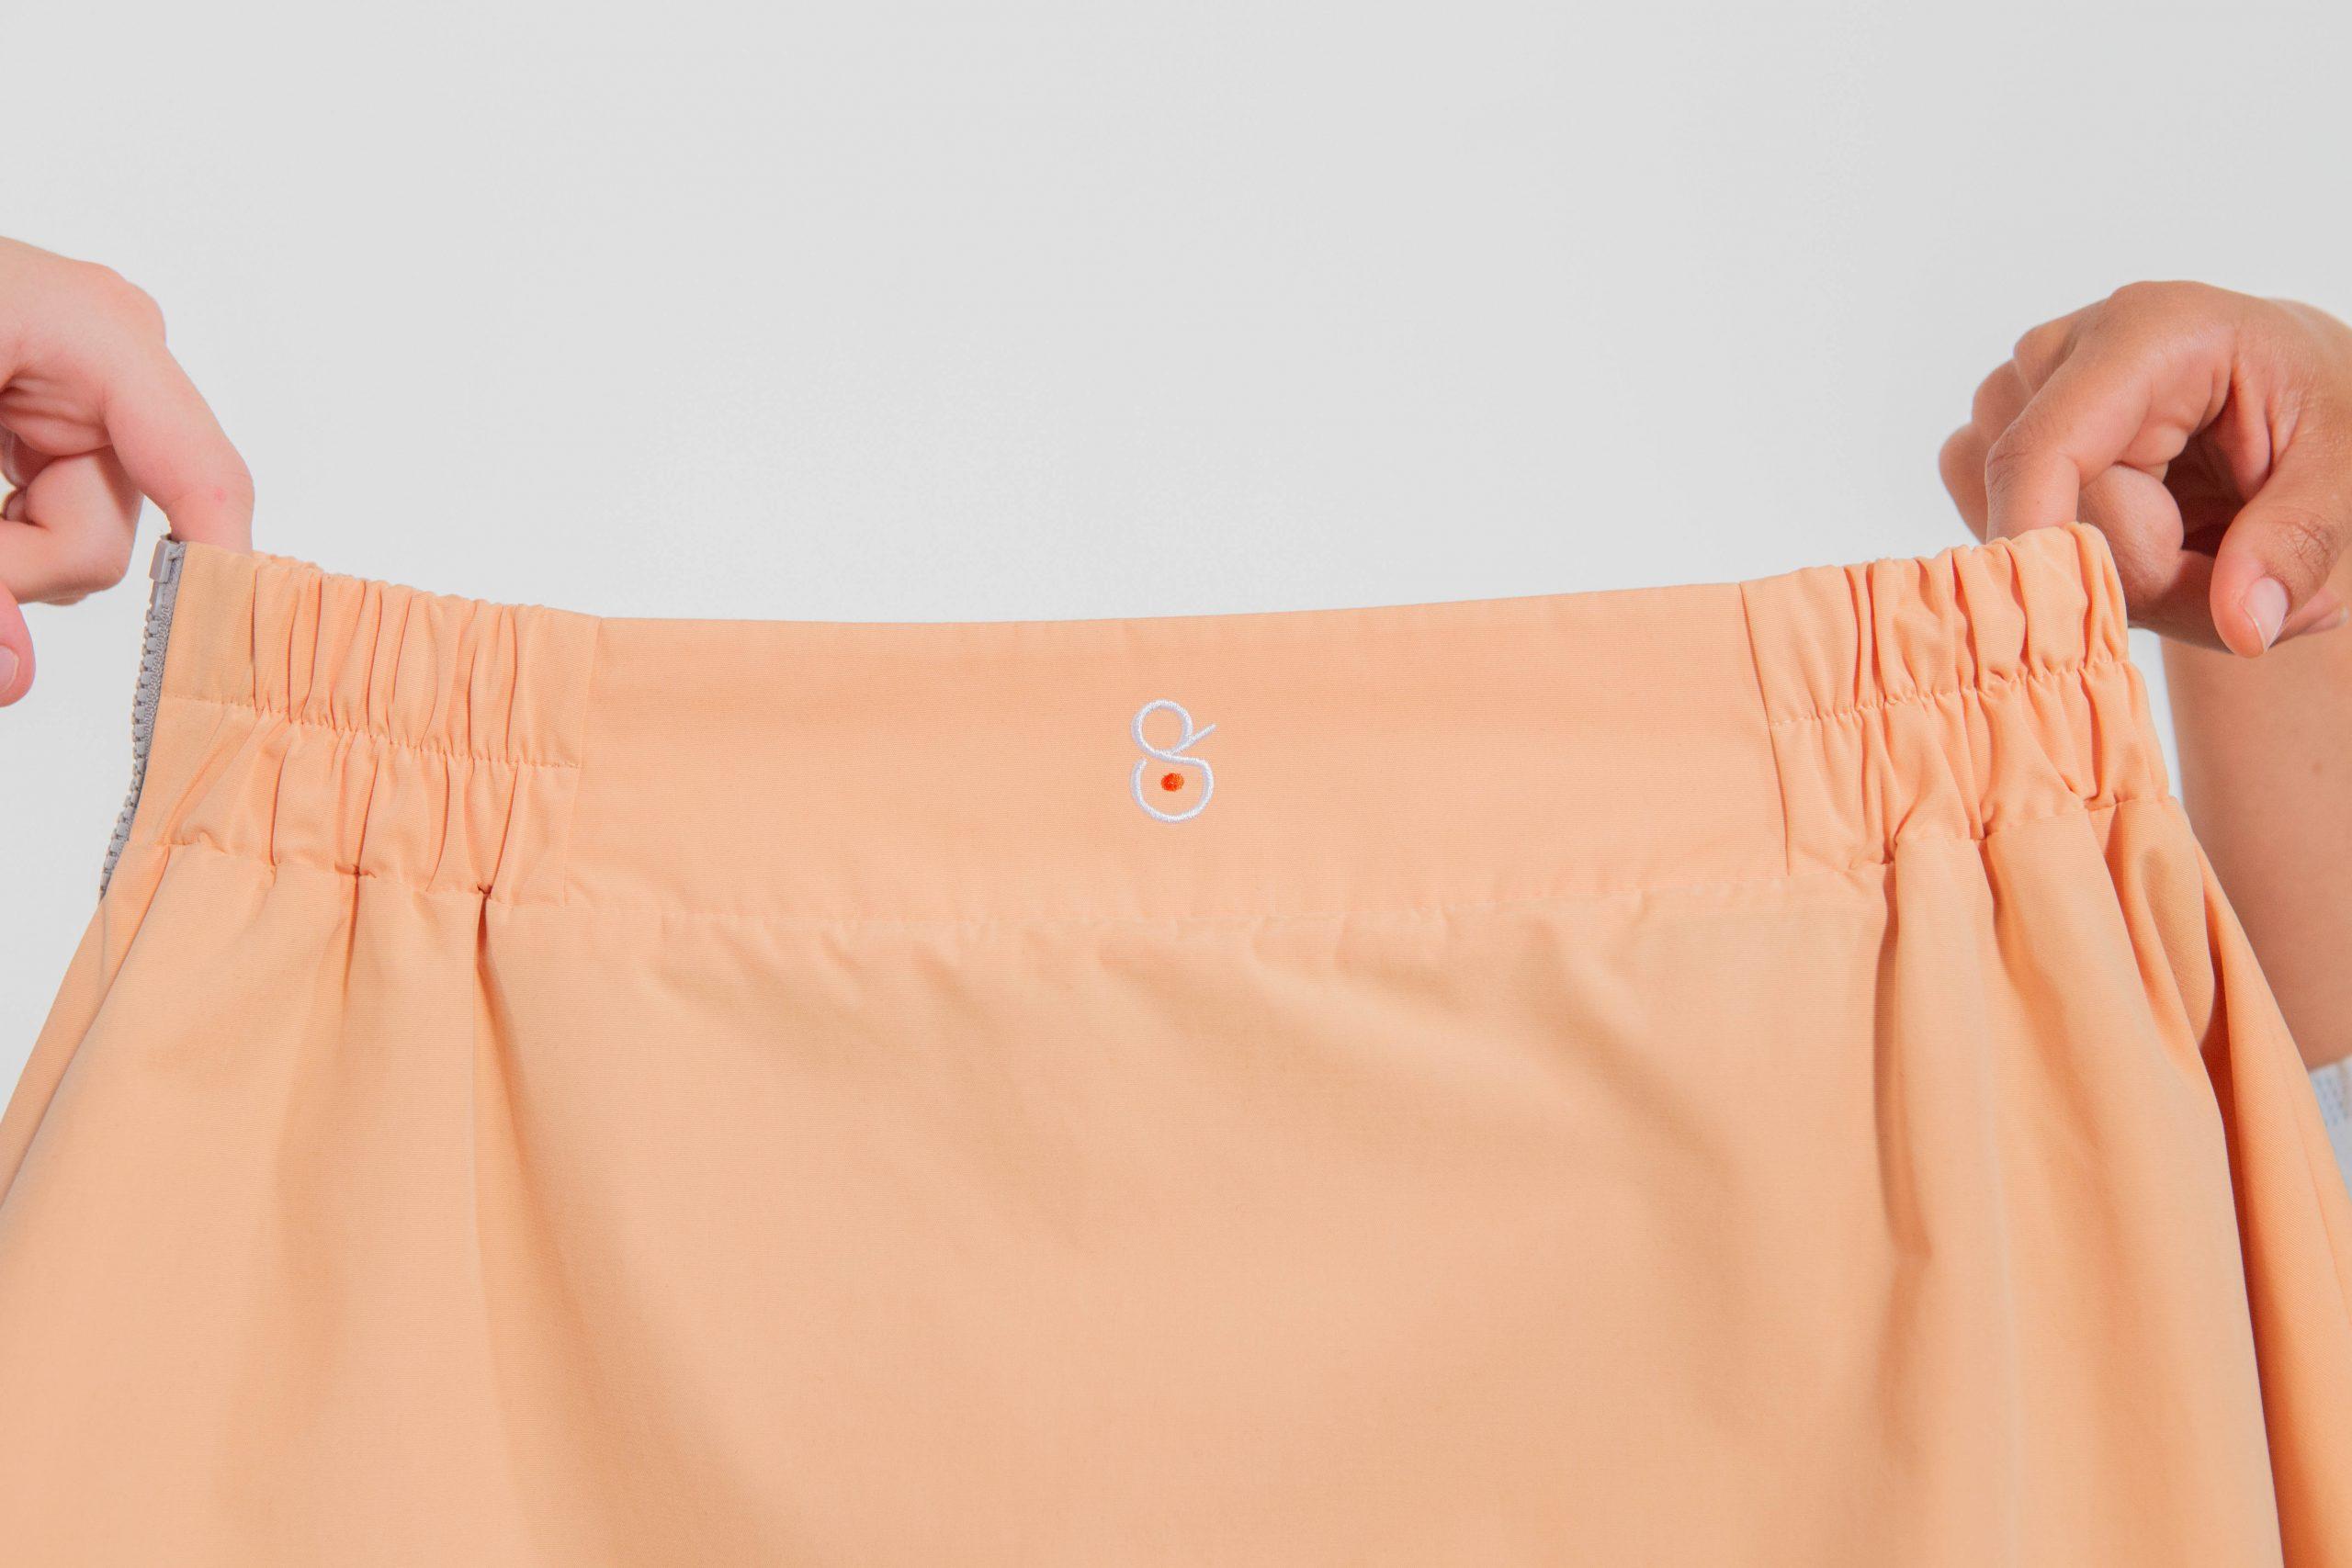 Sur-jupe clara abricot cityrideuz